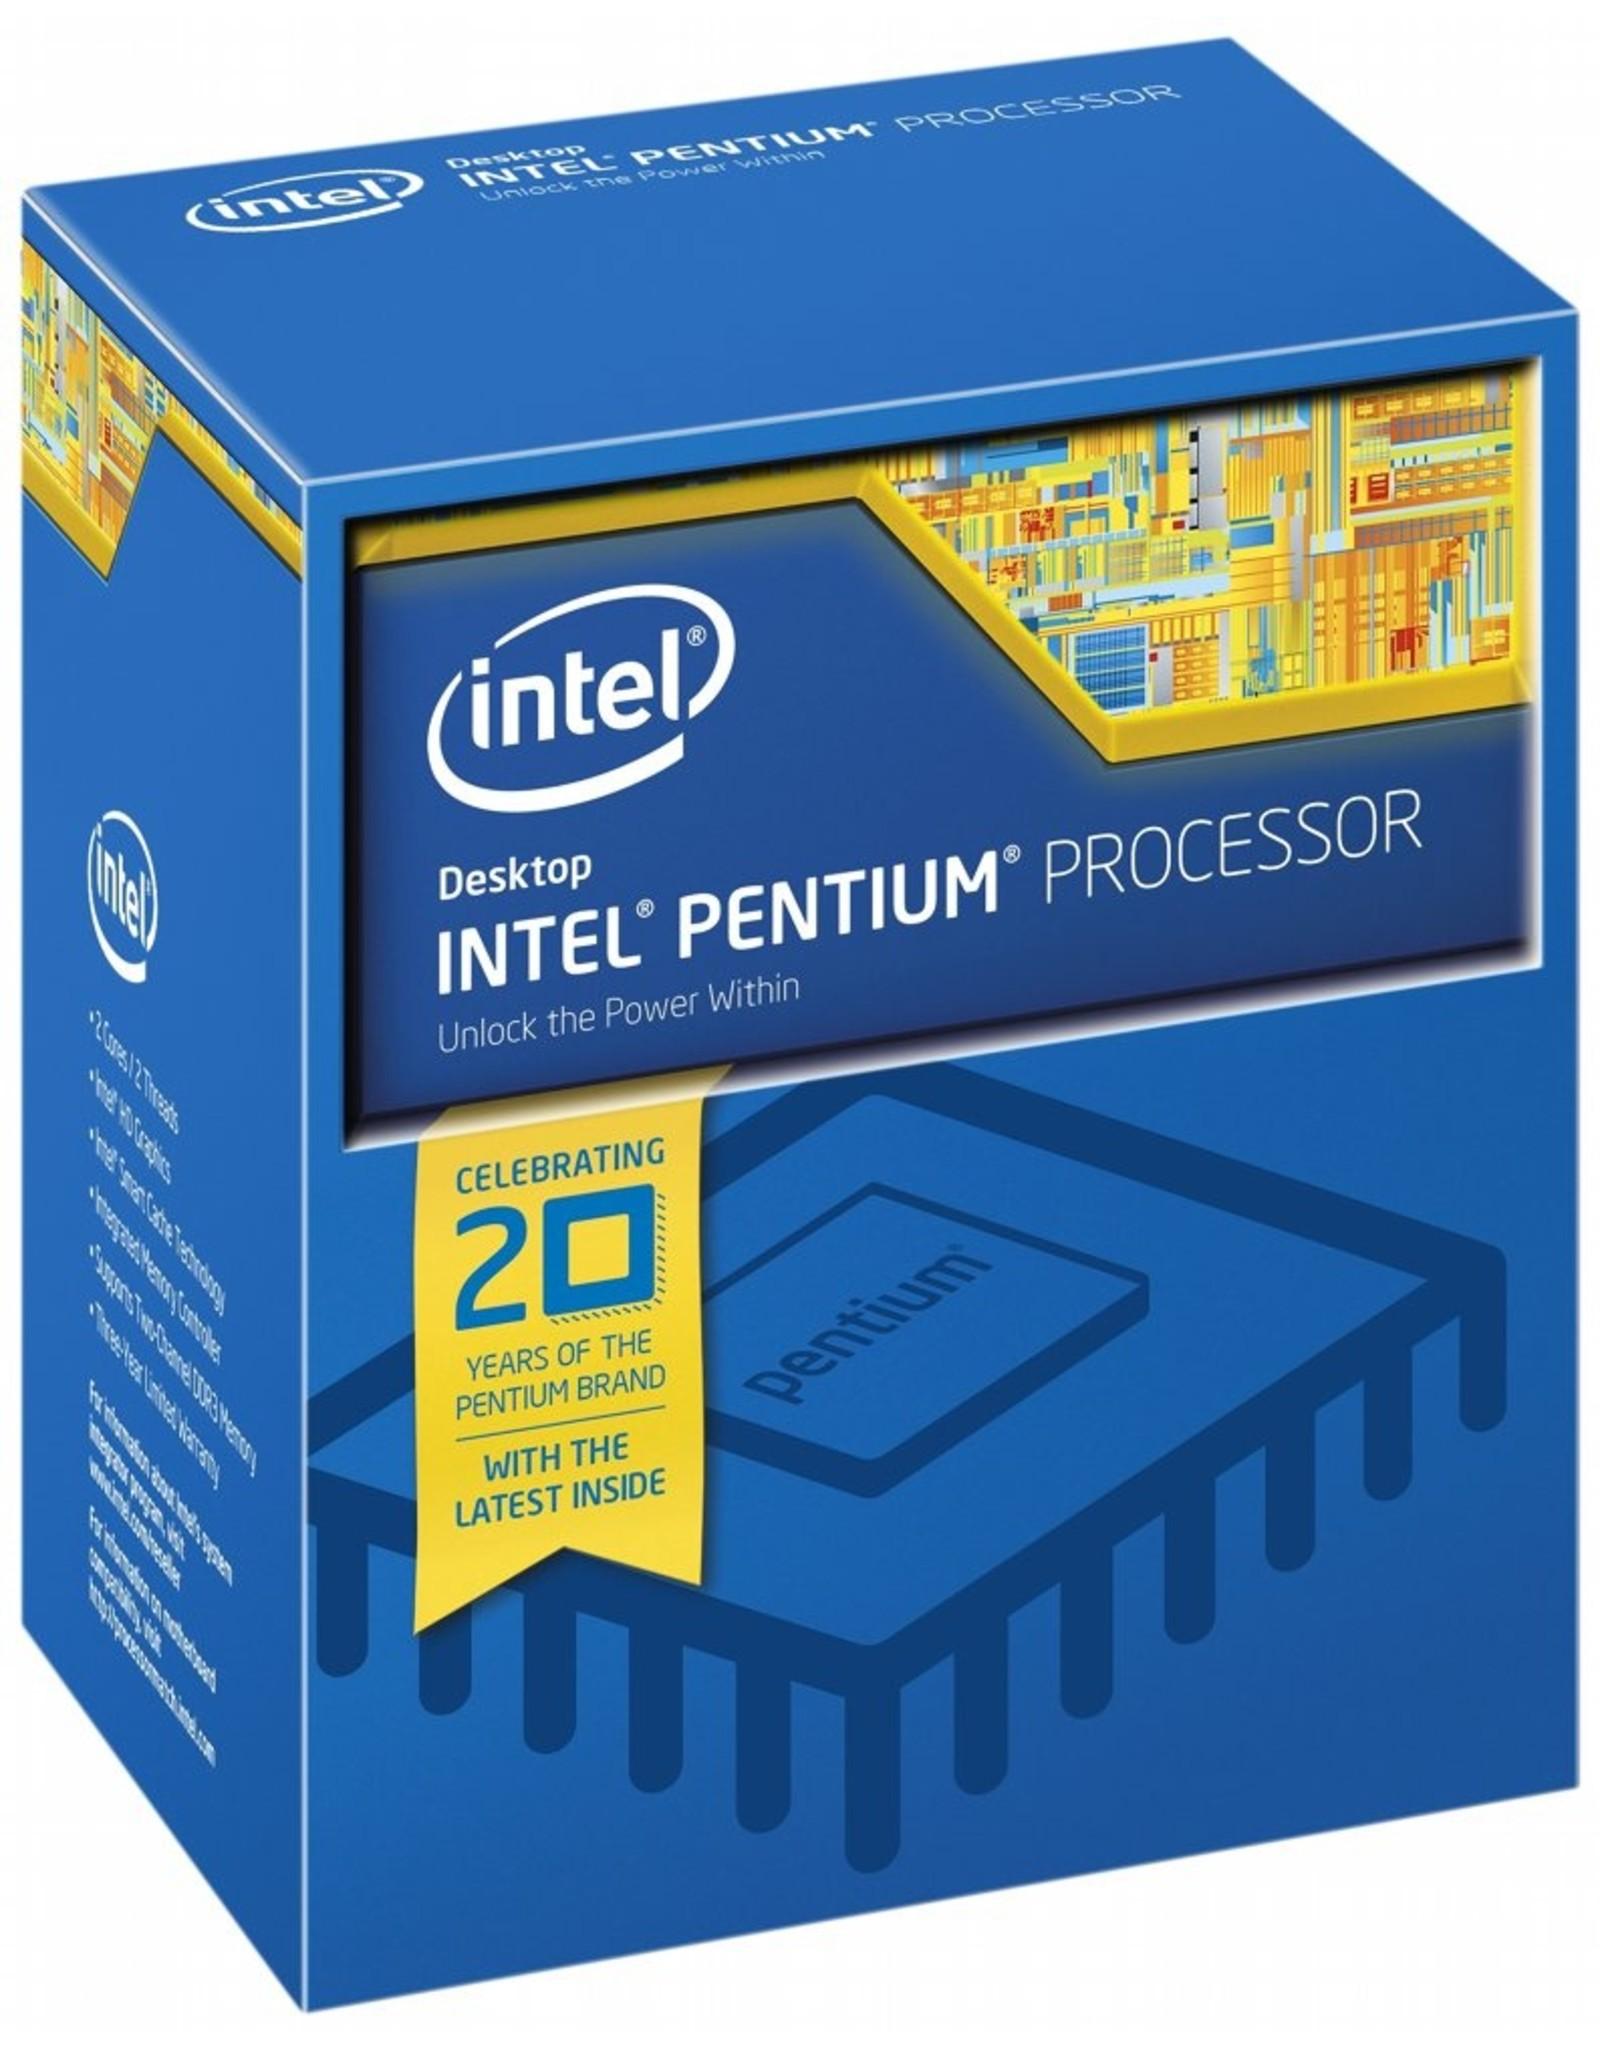 Intel Pentium Processor 2C G4500 3.5GHz 3MB Cache (refurbished)